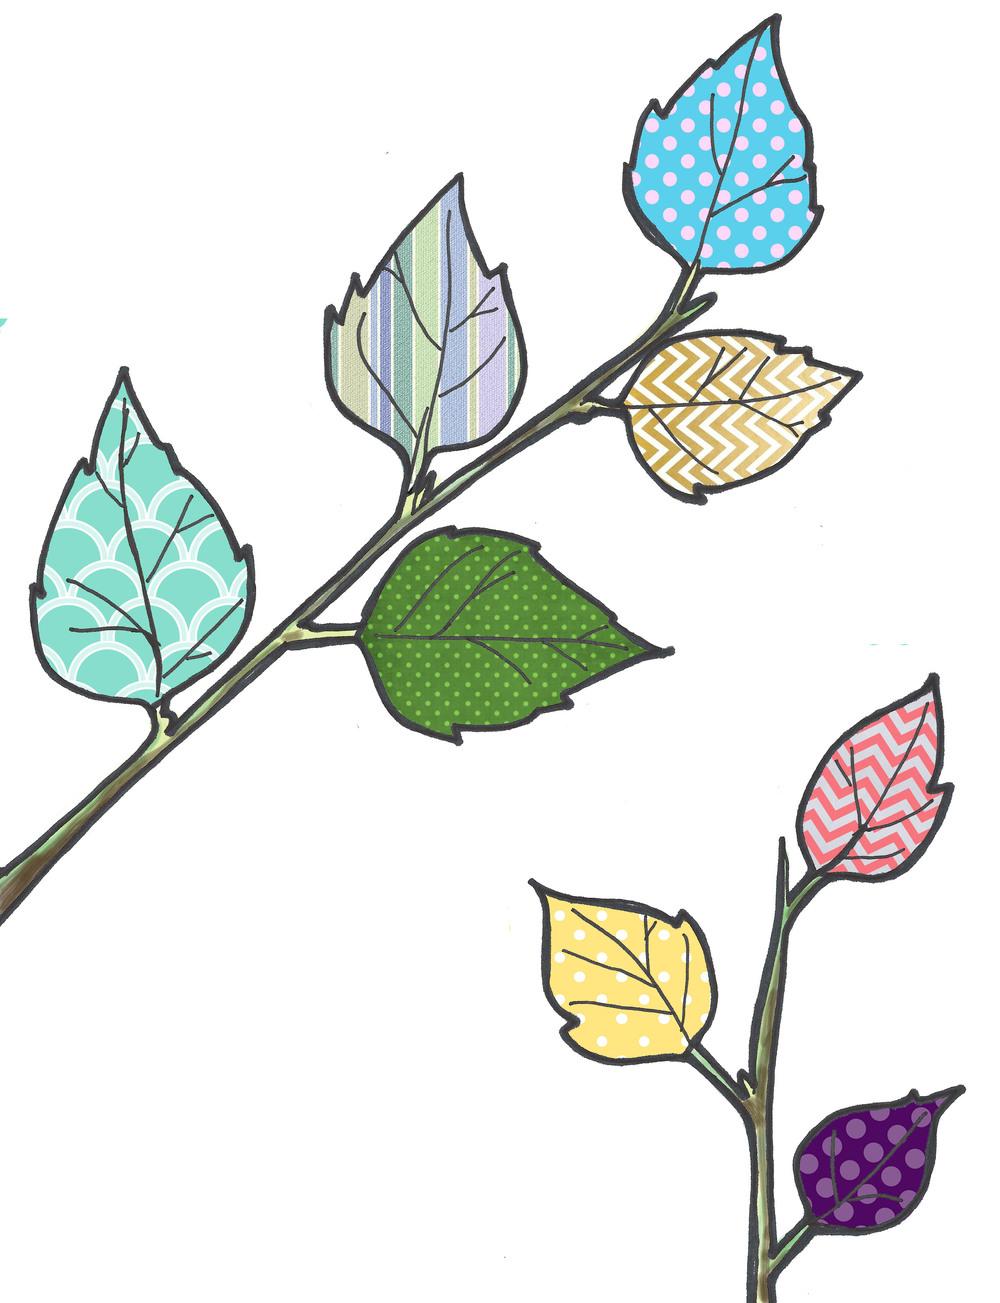 - birch leaves illustration -